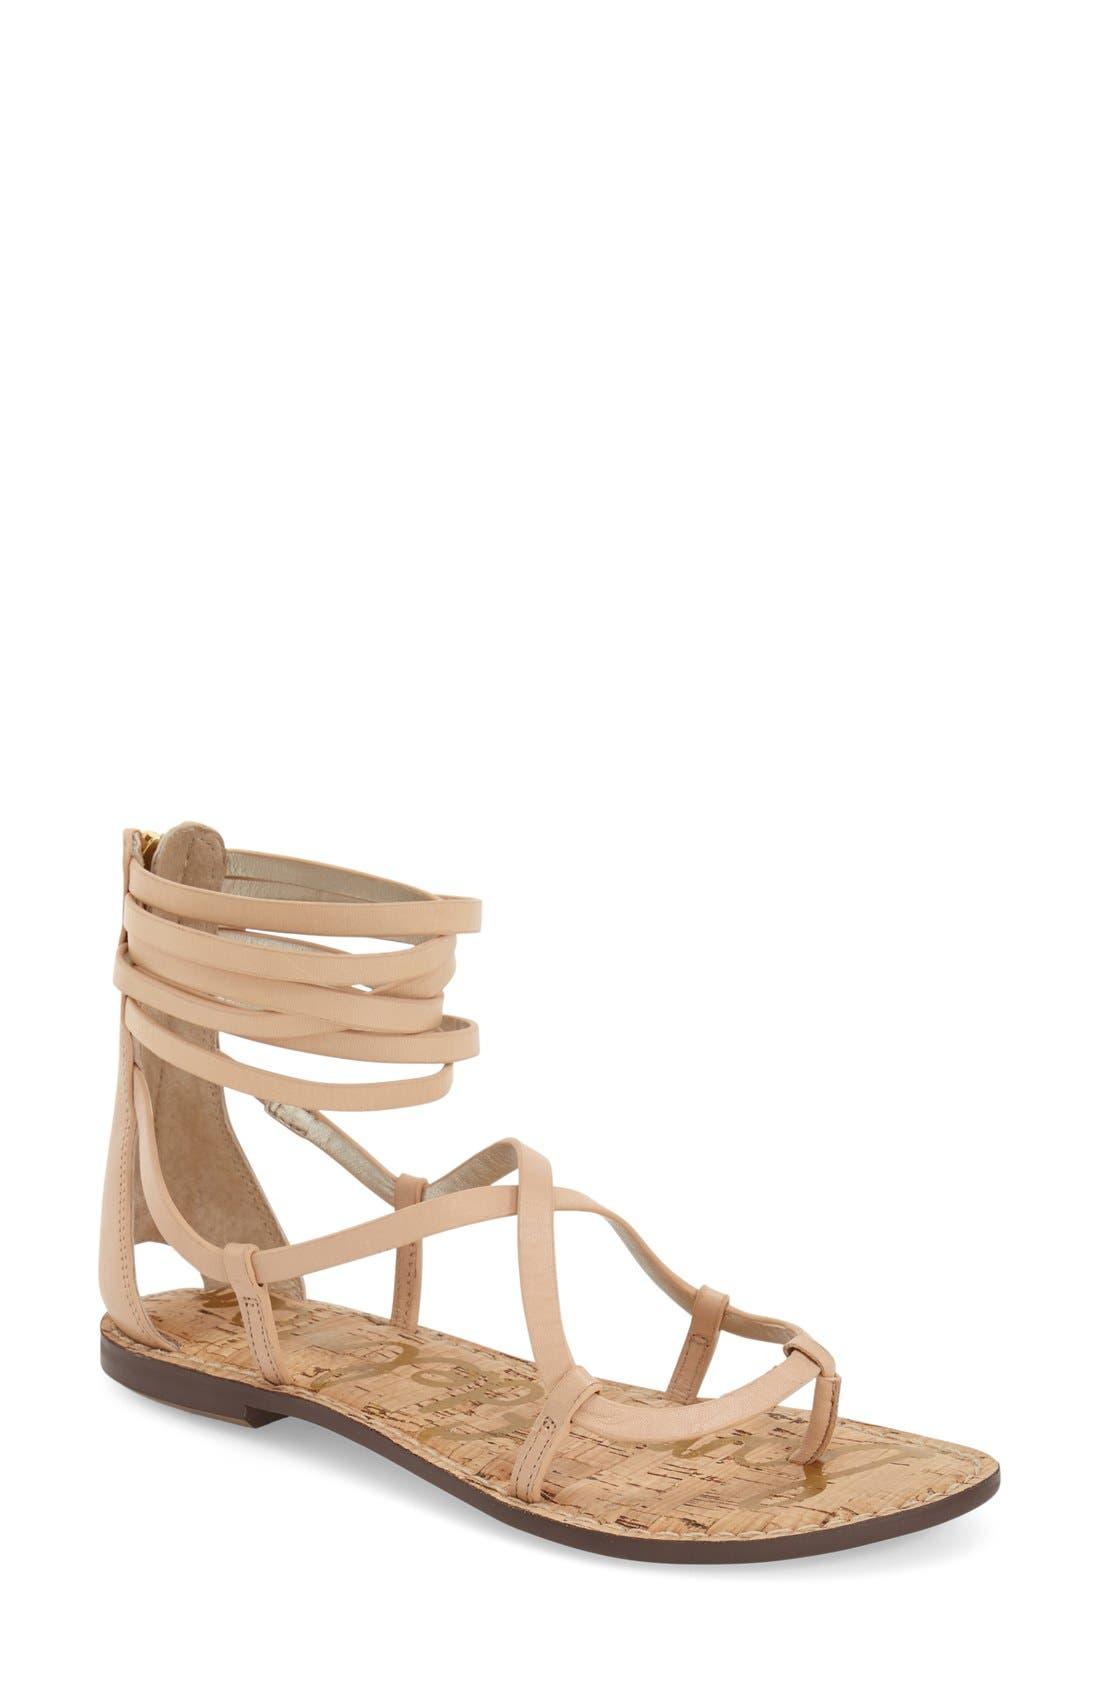 'Ginette' Sandal,                         Main,                         color, Natural Naked Leather